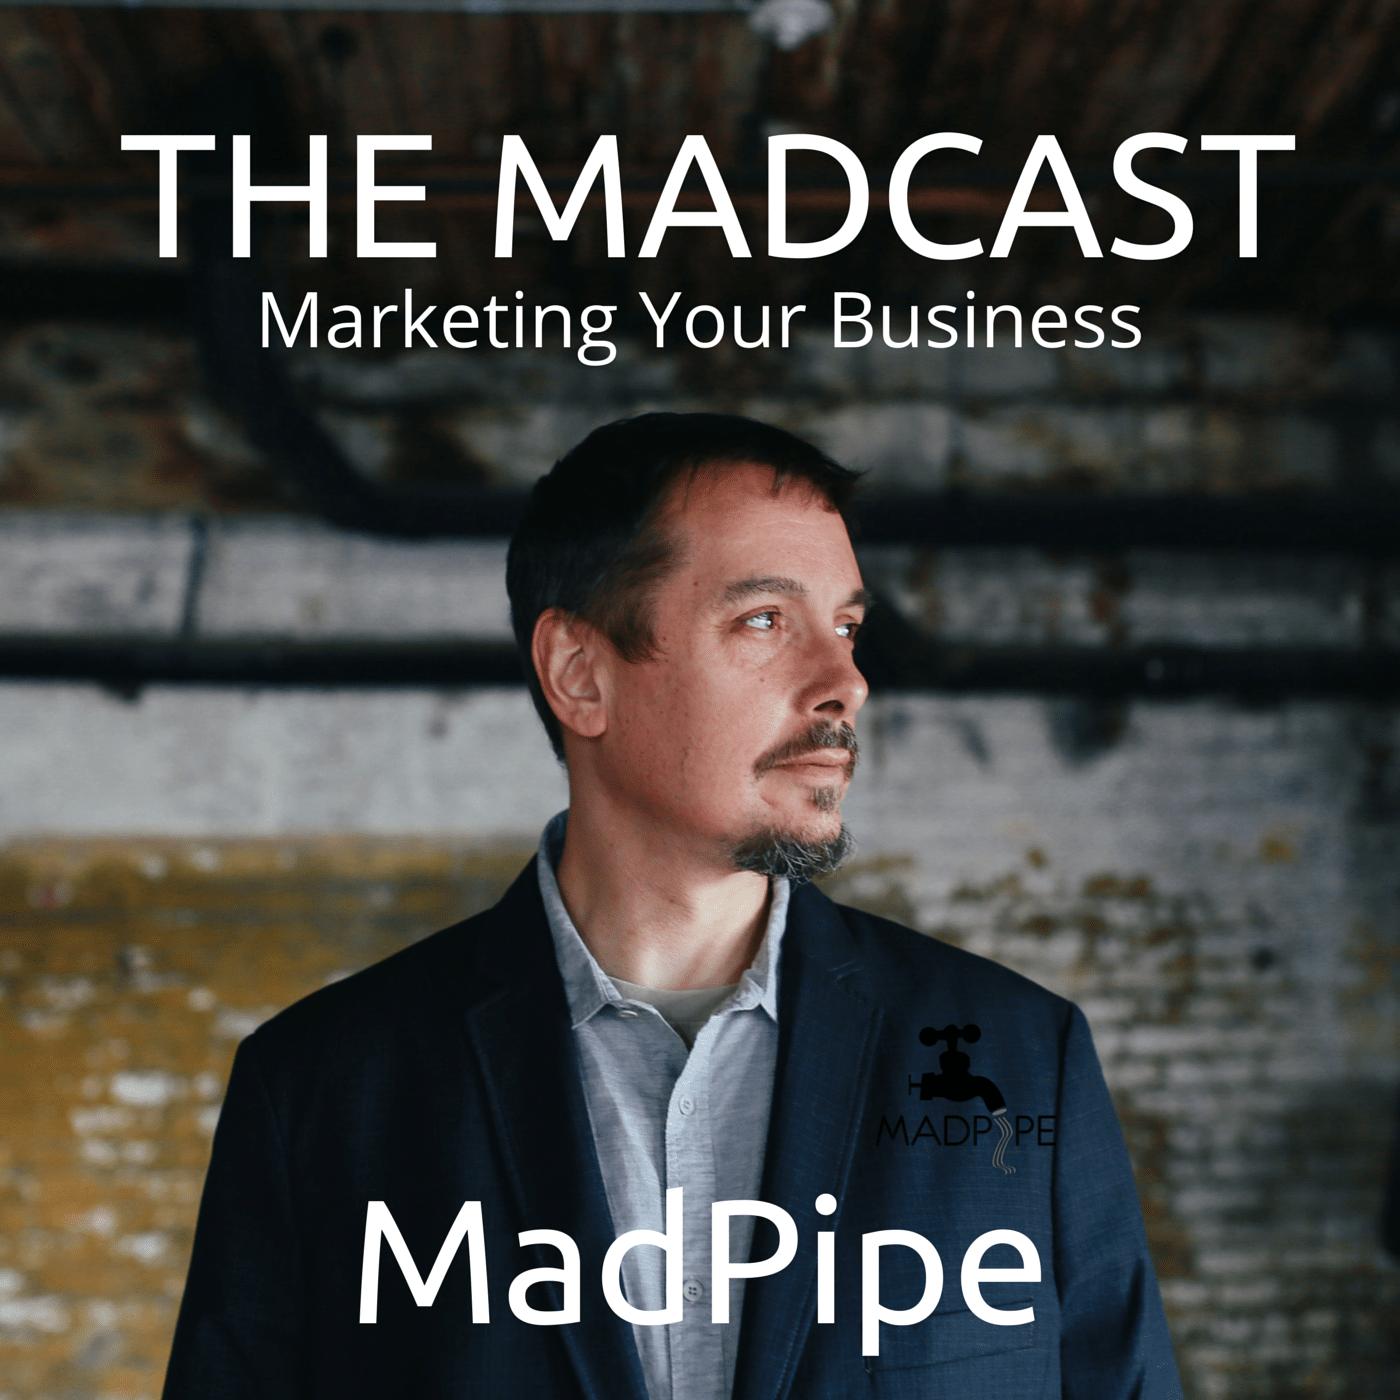 The Marketing Madcast